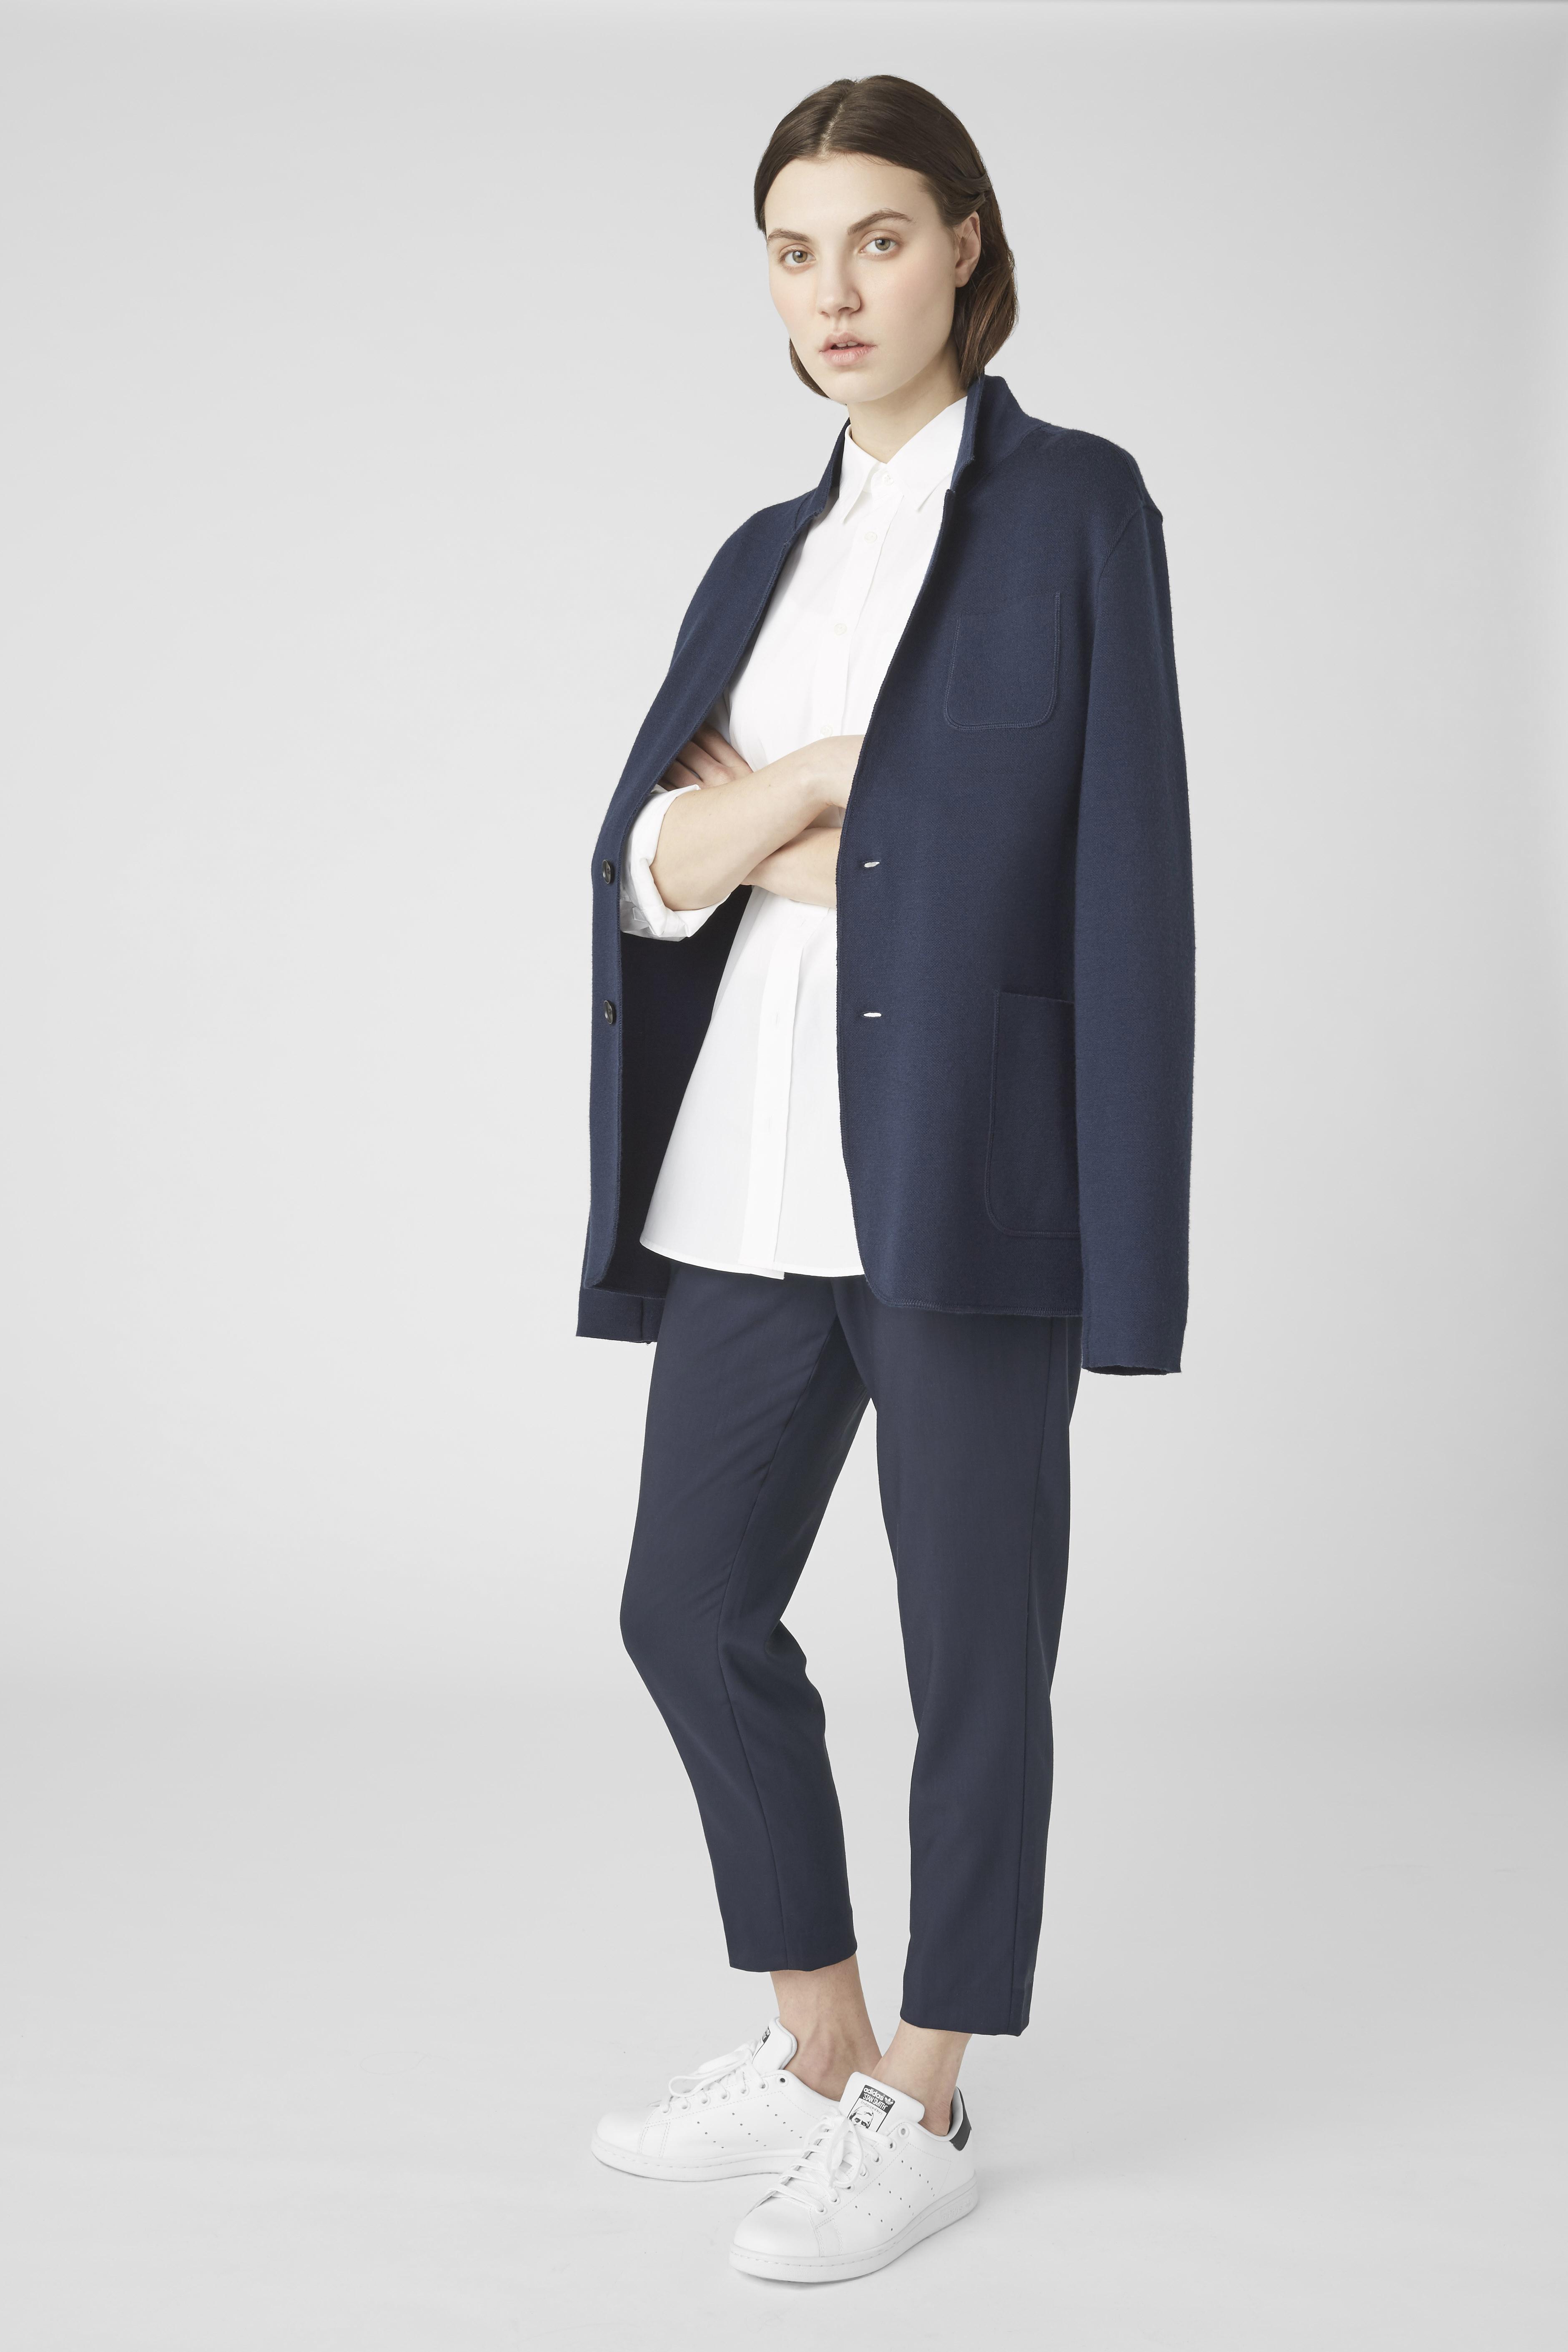 Future fashion trends 2014 - Future Fashion Trends 2014 45